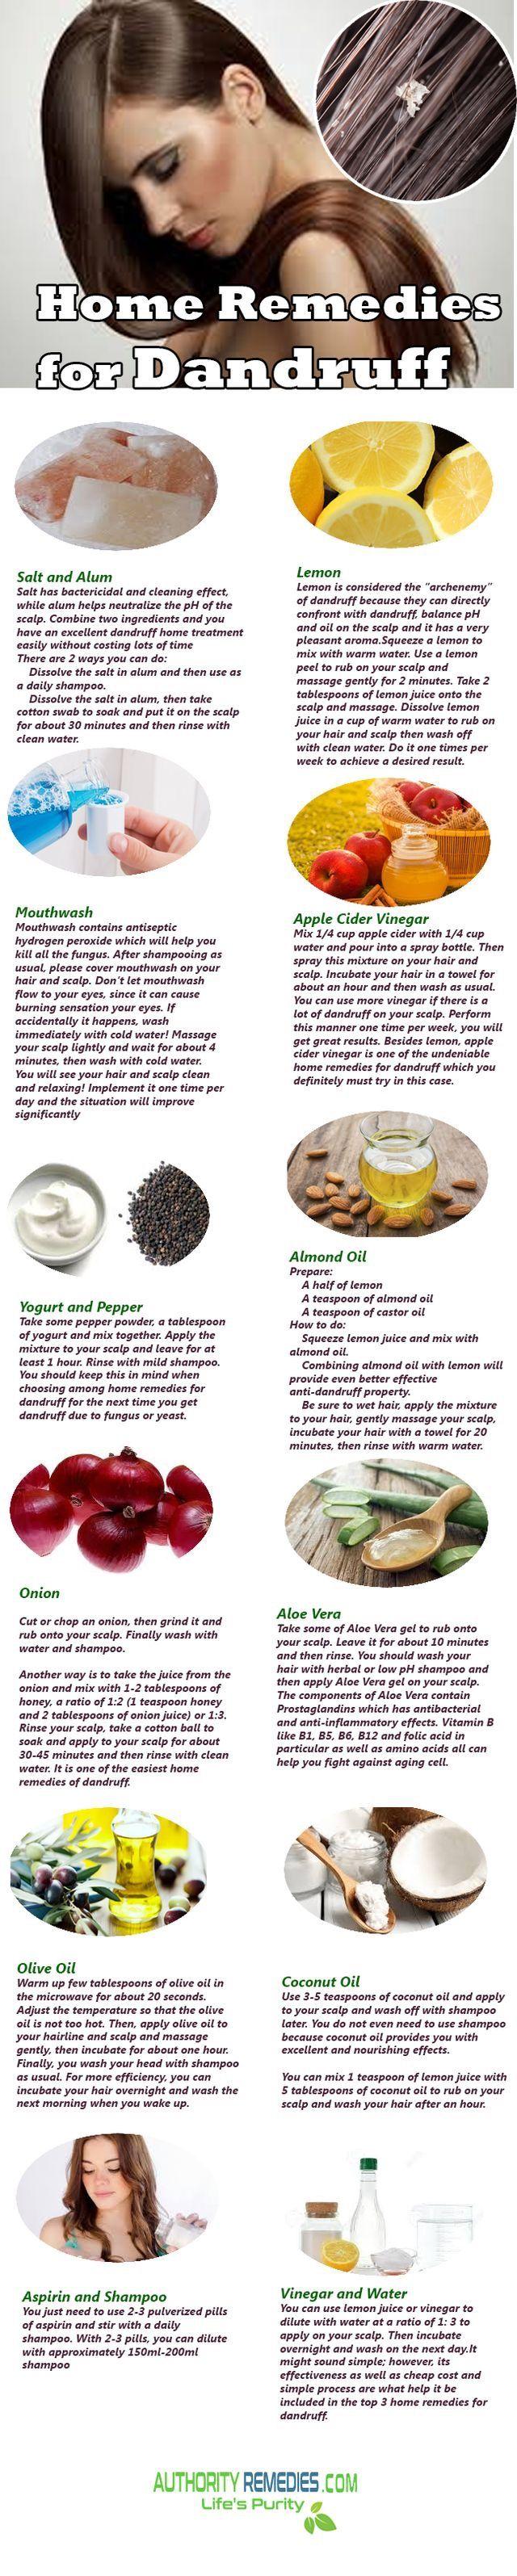 Home Remedies for Dandruff.